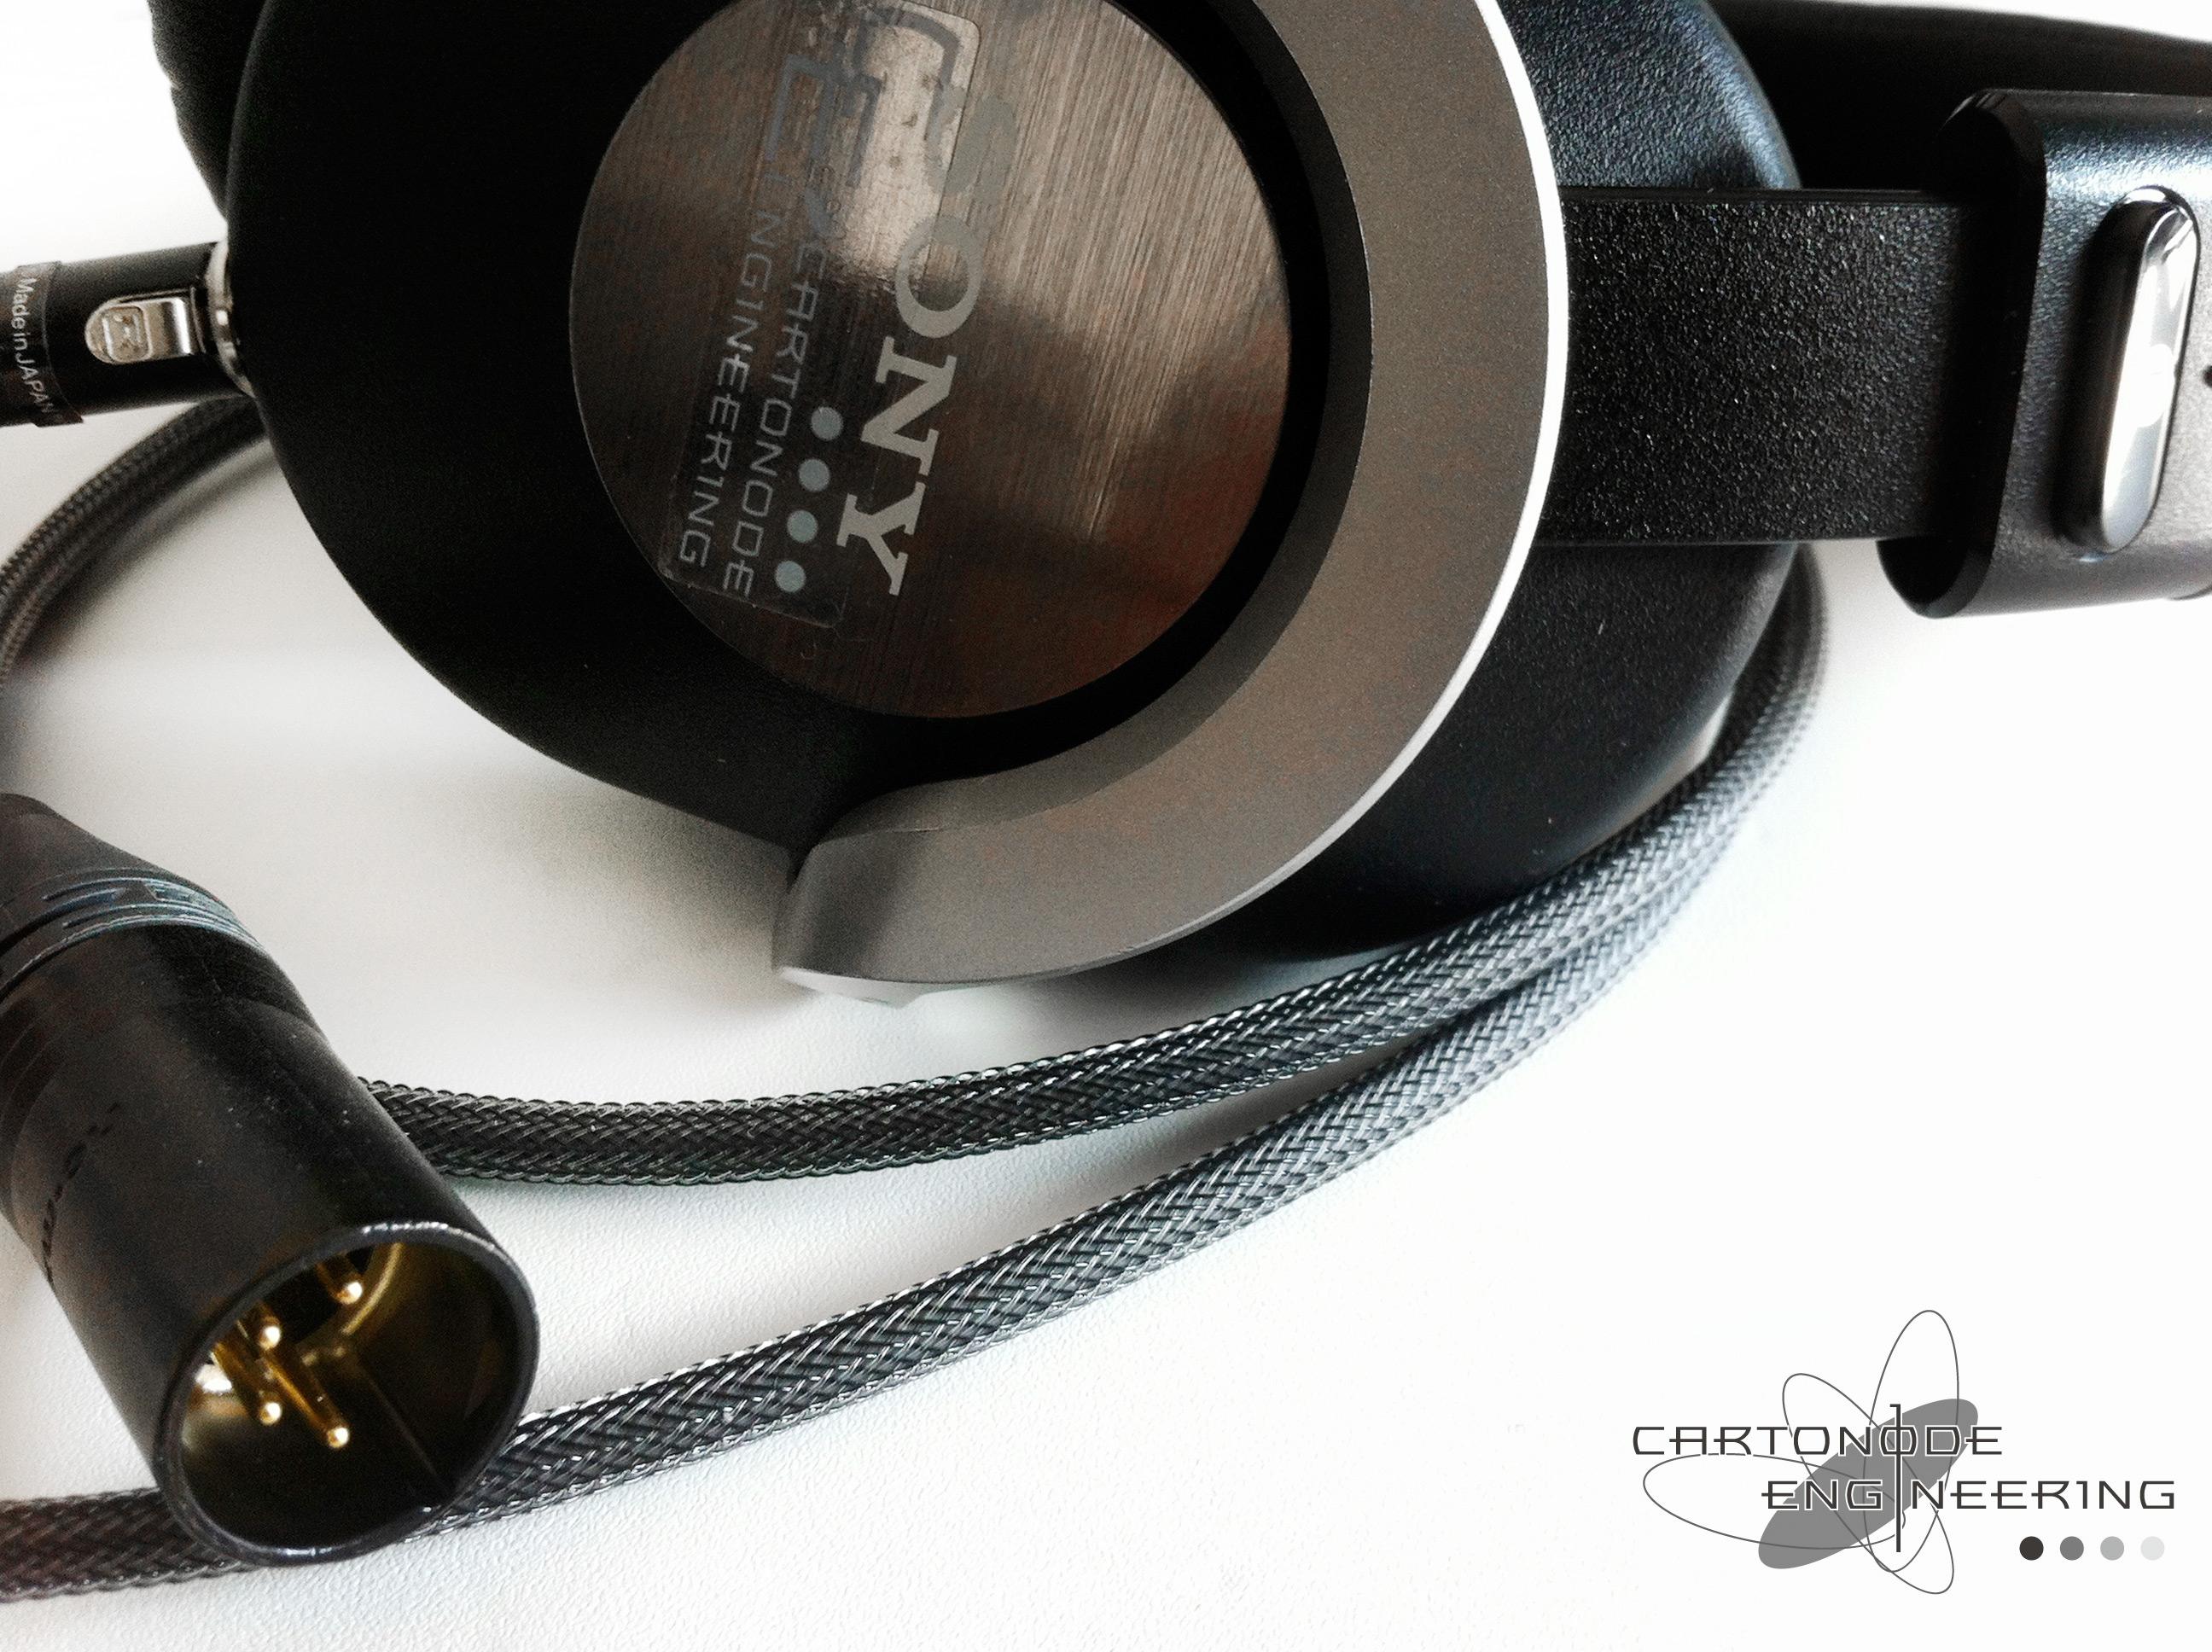 CE-MDR-ZX700mod_4XLR_2